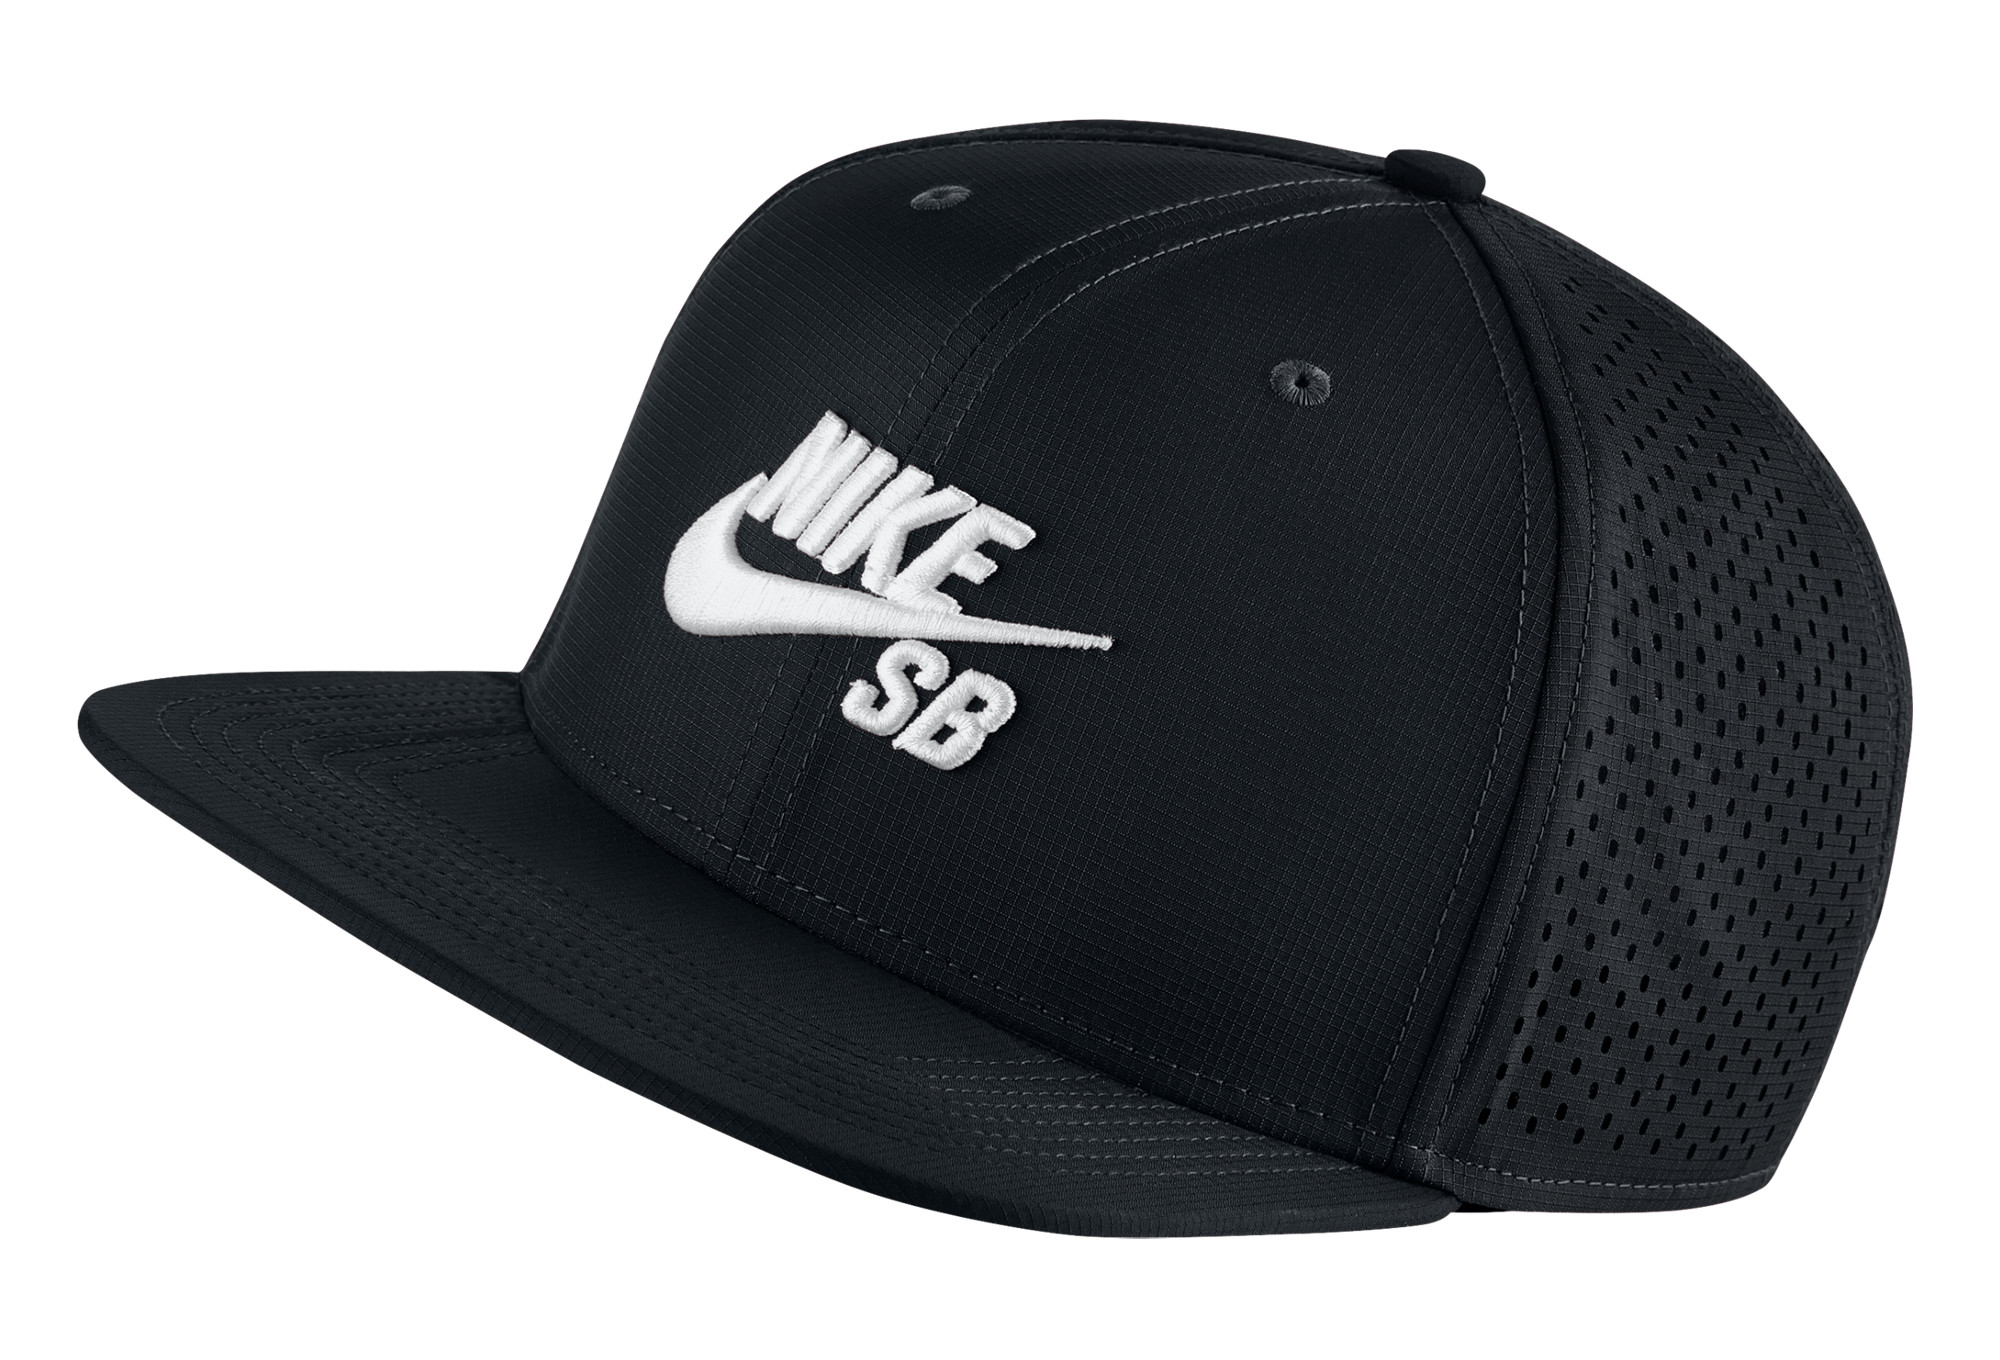 Nike SB Hat Black  28a59cbbcbd